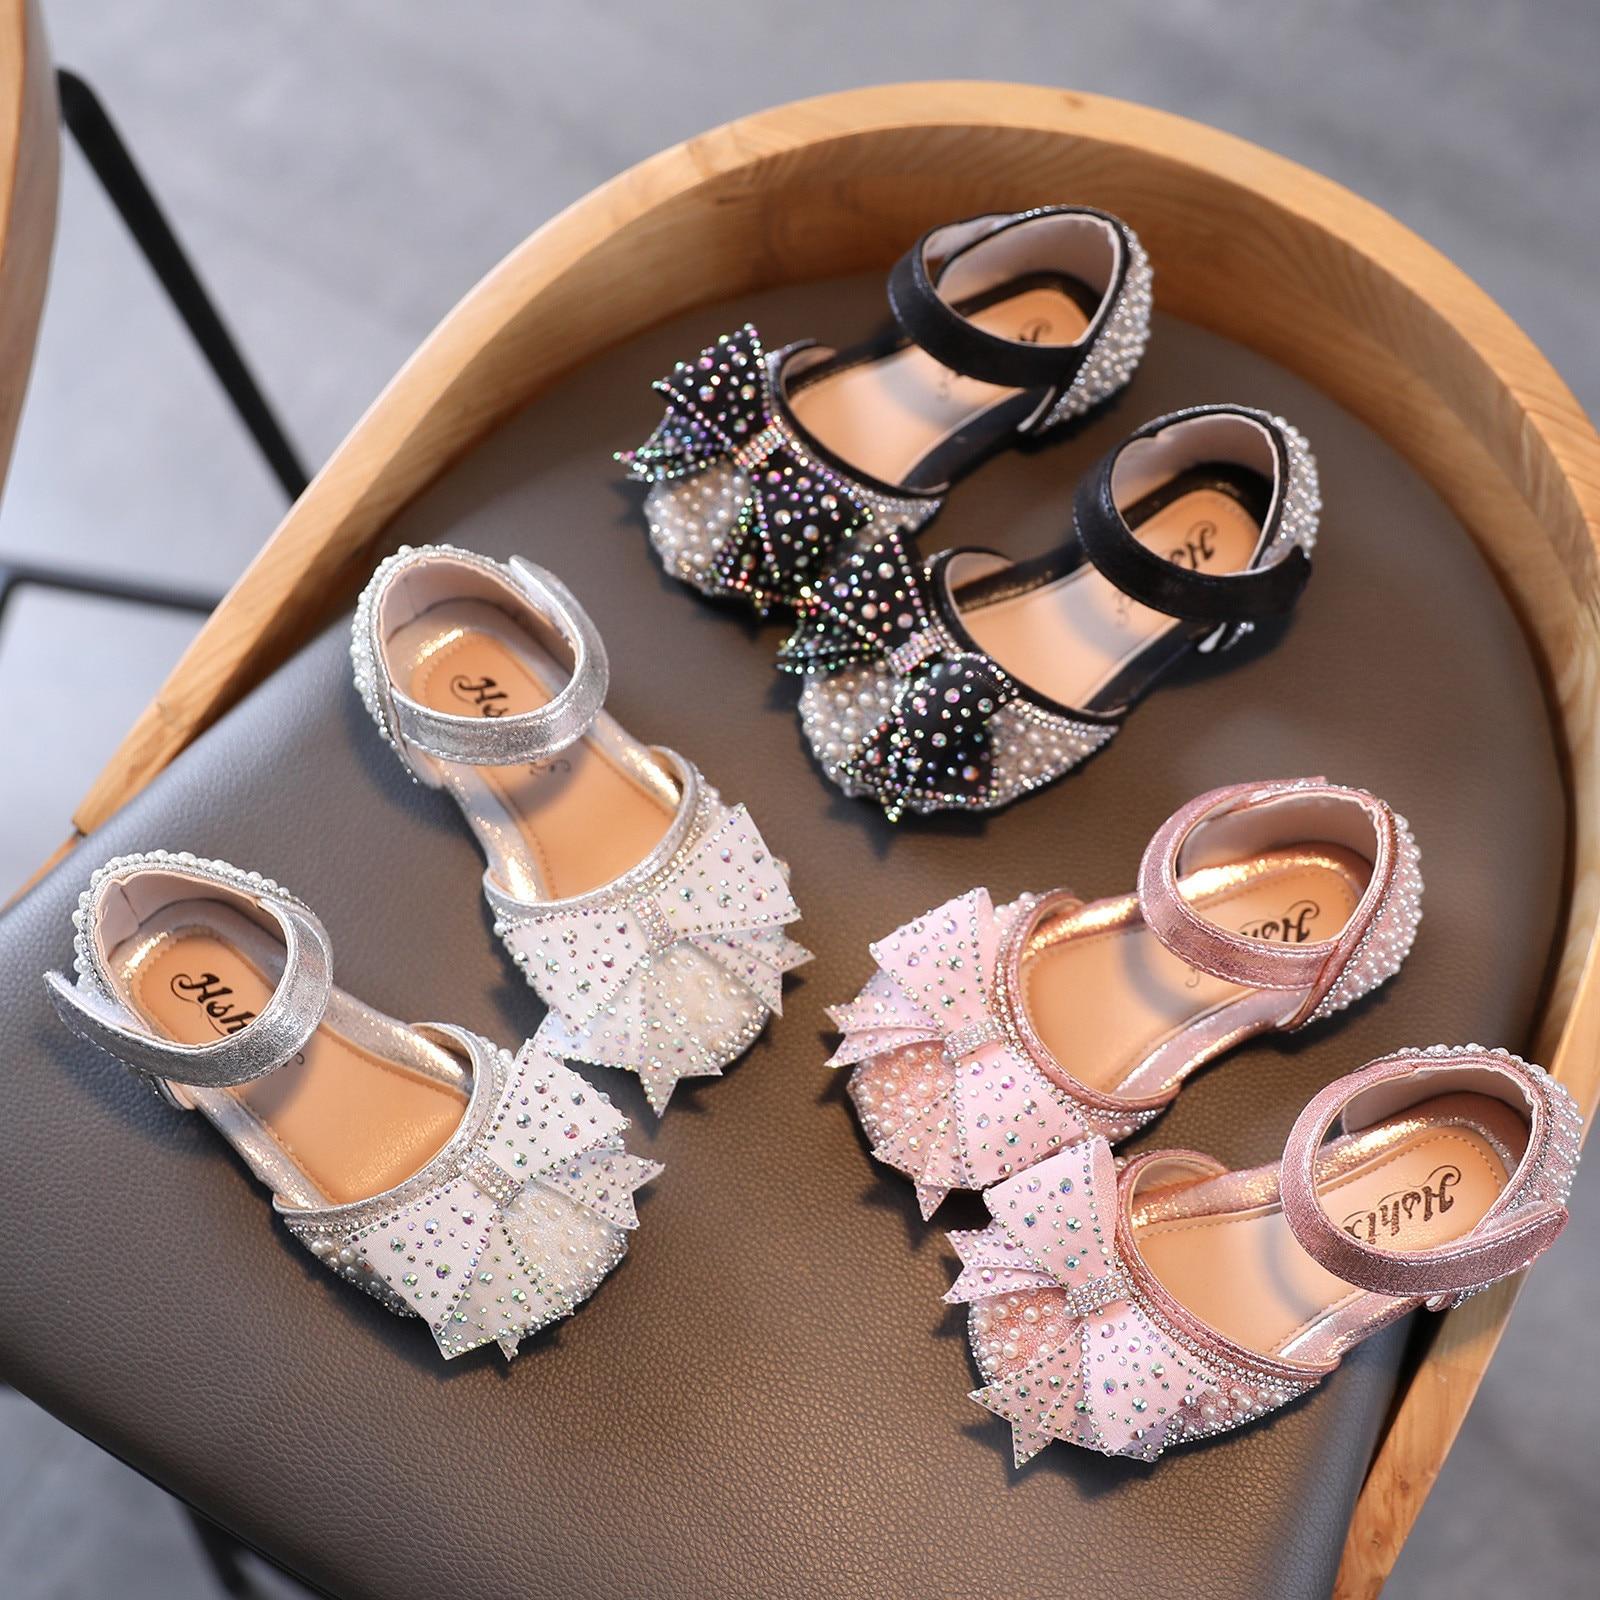 New Arrival Rhinestone Girls Princess Sandals Toddler Infant Kids Baby Bowknot Crystal Sweet Shoes Sandalias детская обувь W*